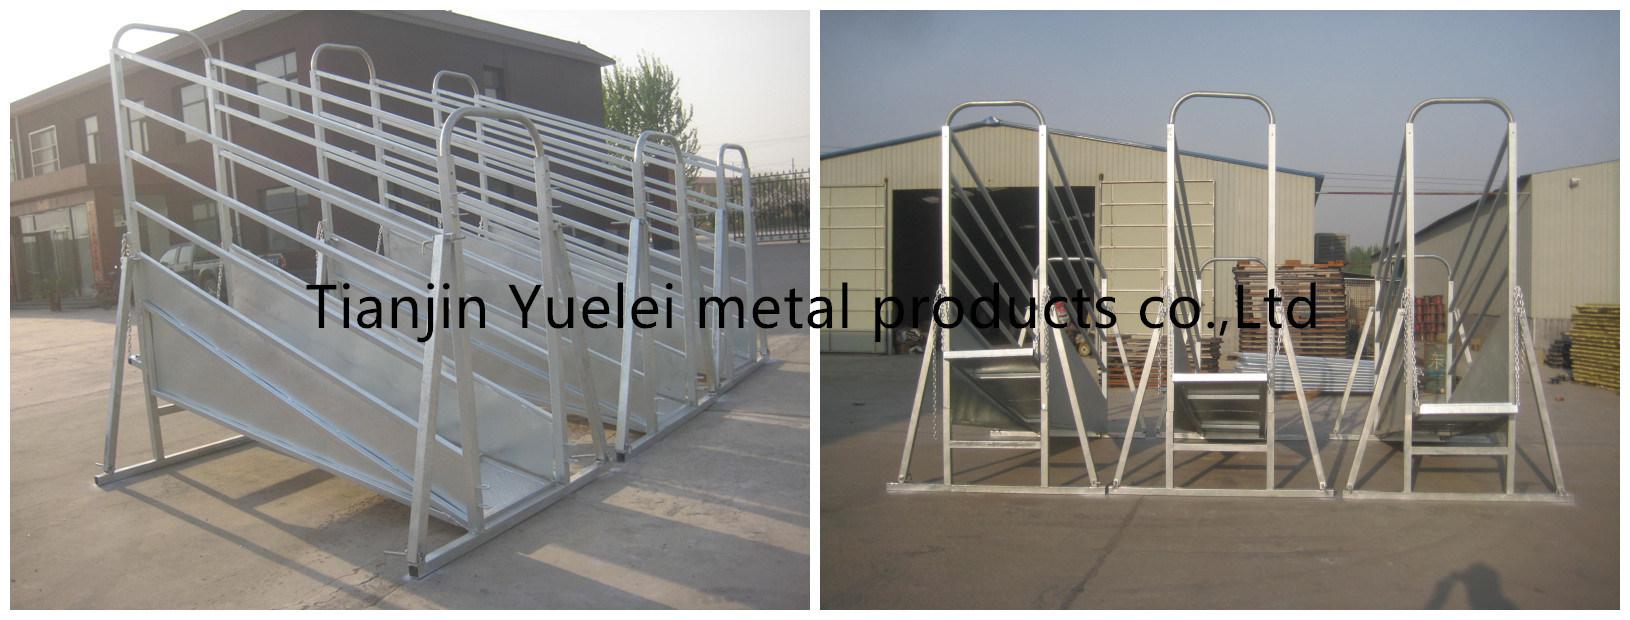 6 Rail Galvanized Cattle Panels